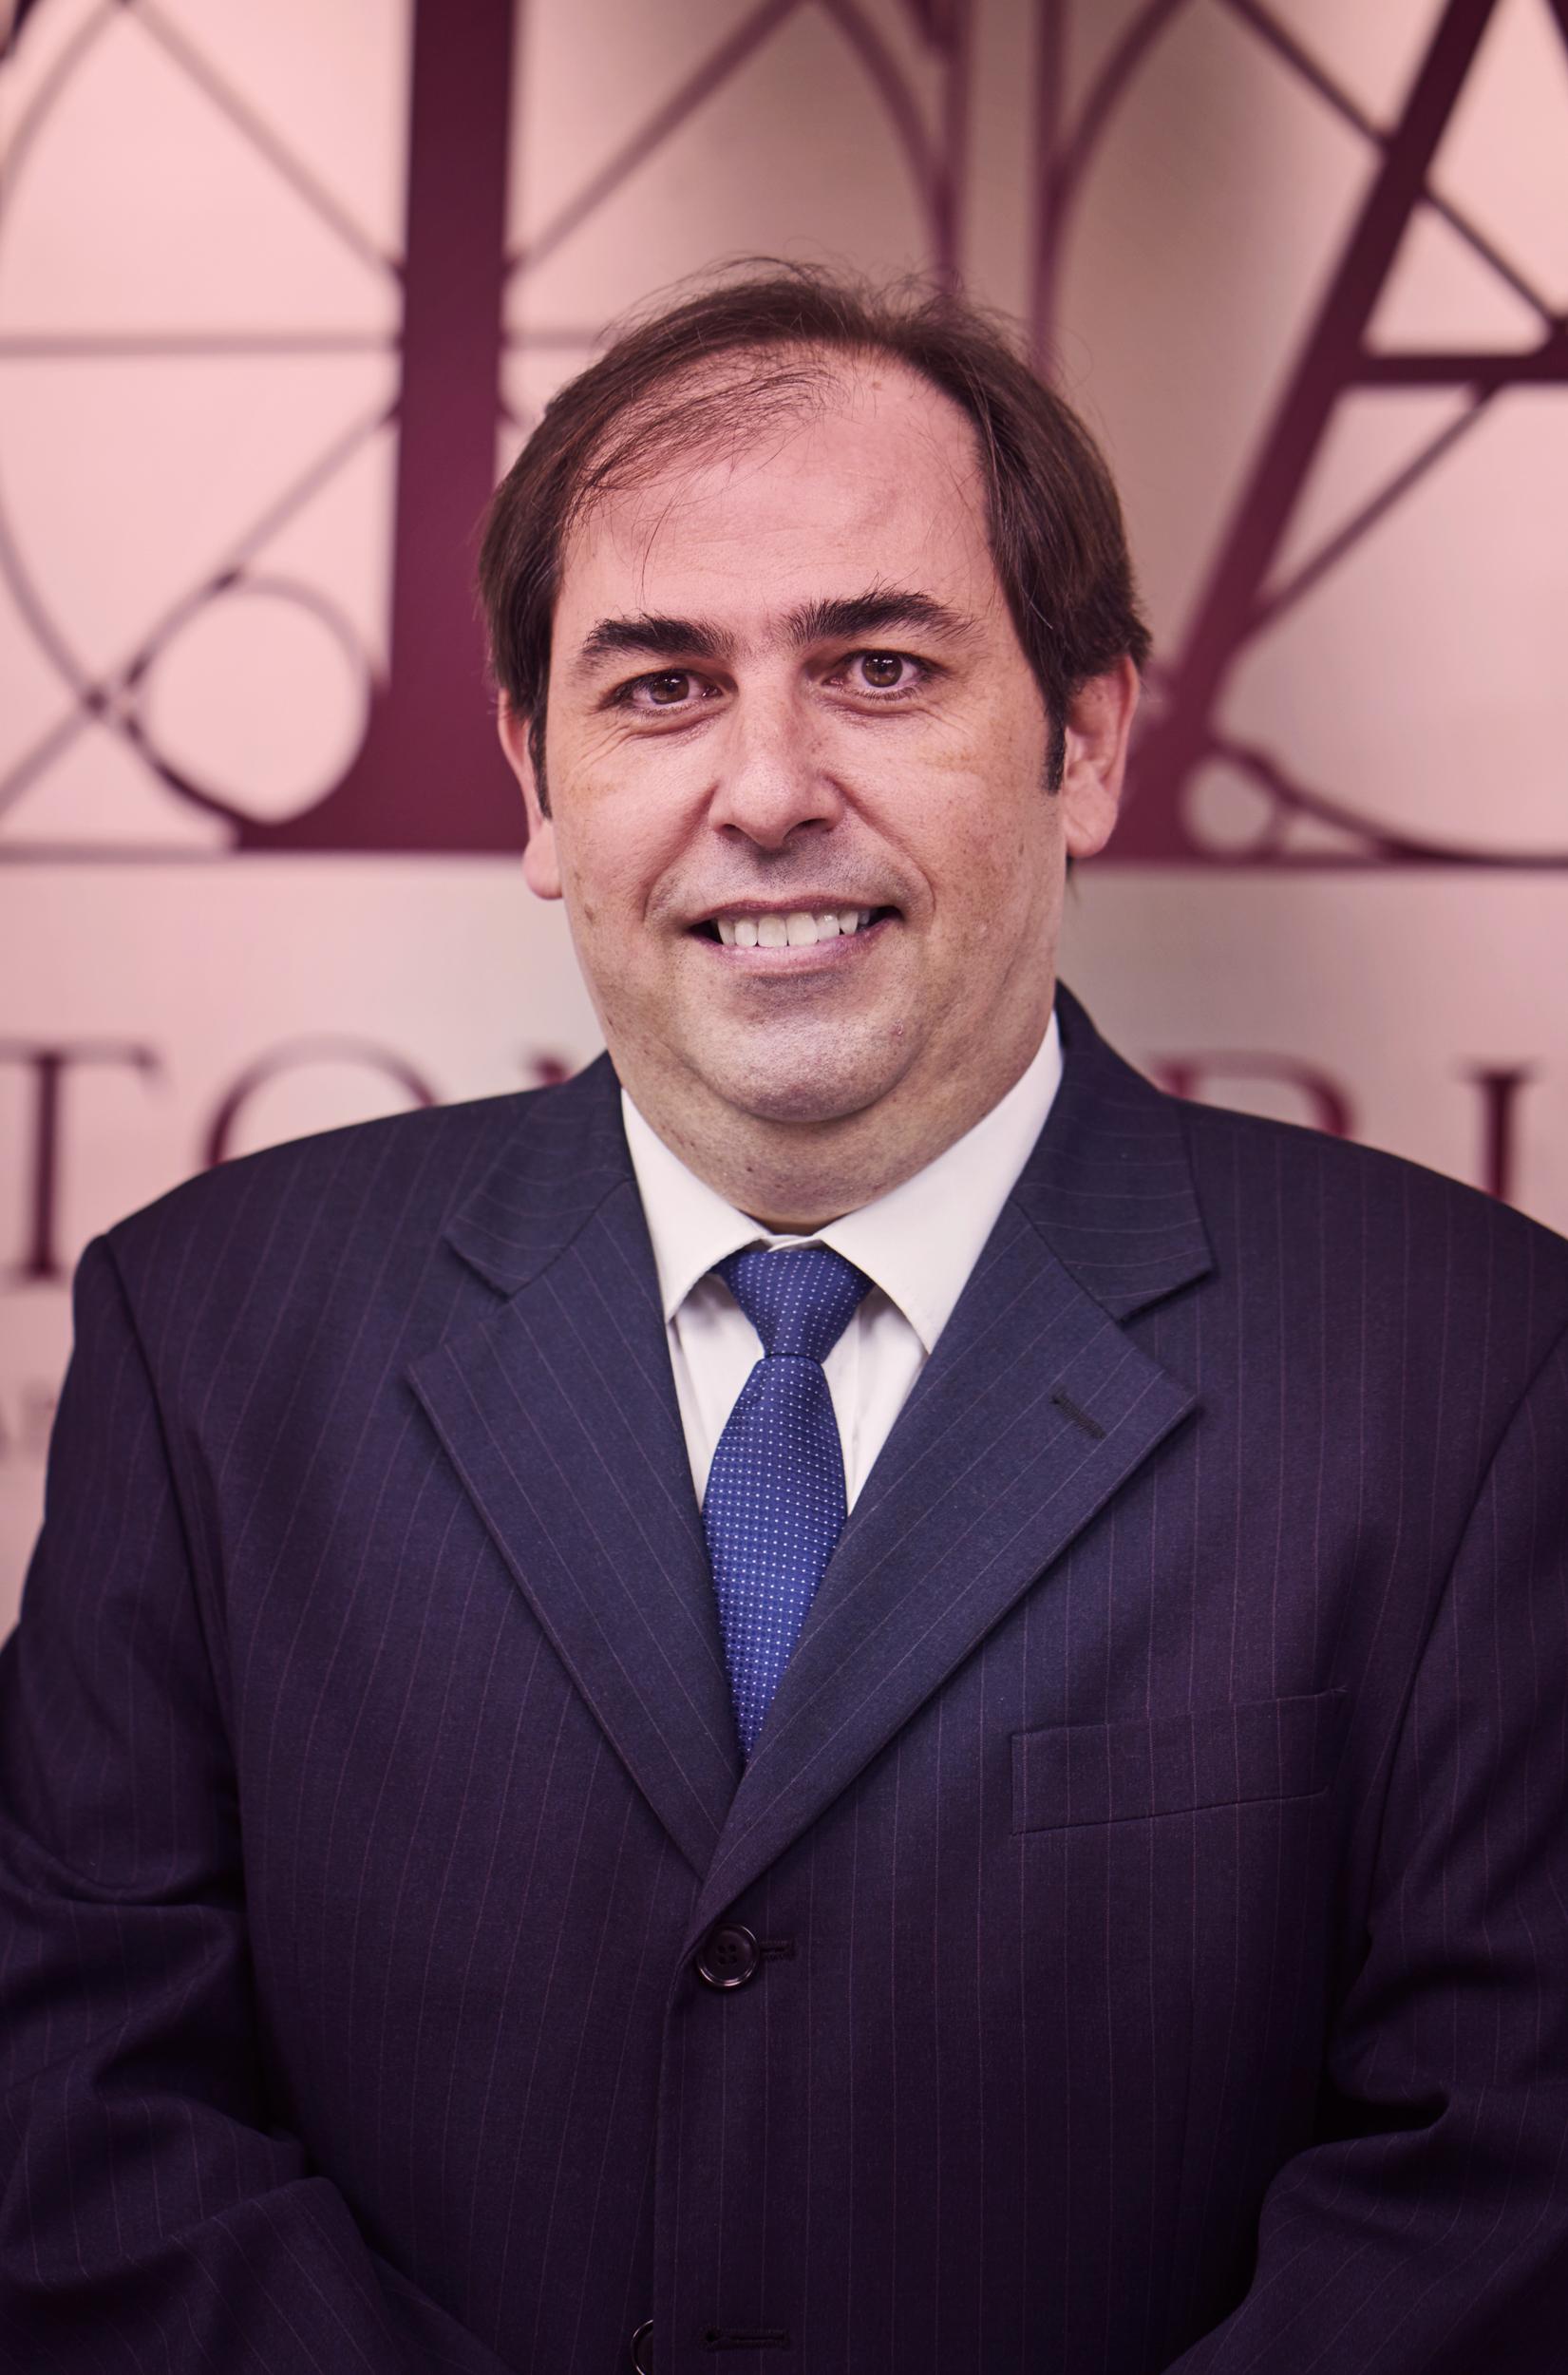 Antonio Blanco Cabezuelo